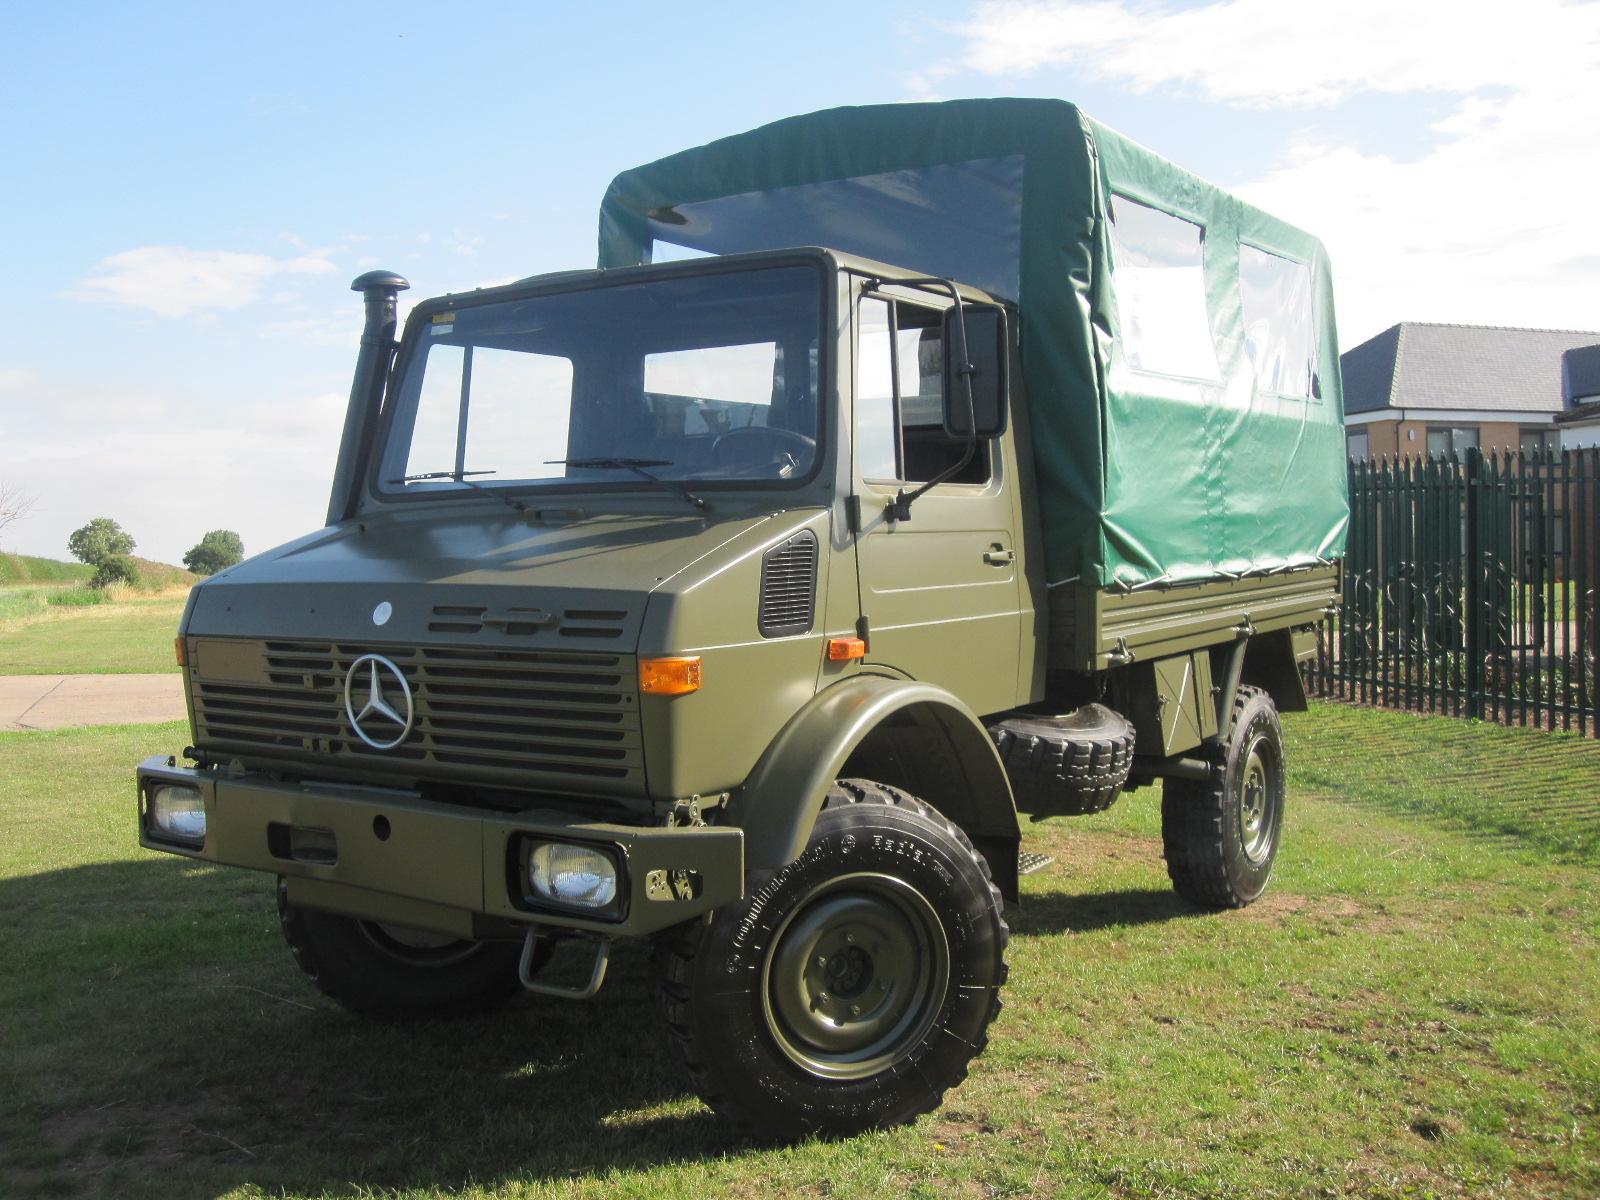 Mercedes Unimog U1300L 4x4 Shoot Vehicle for sale | military vehicles